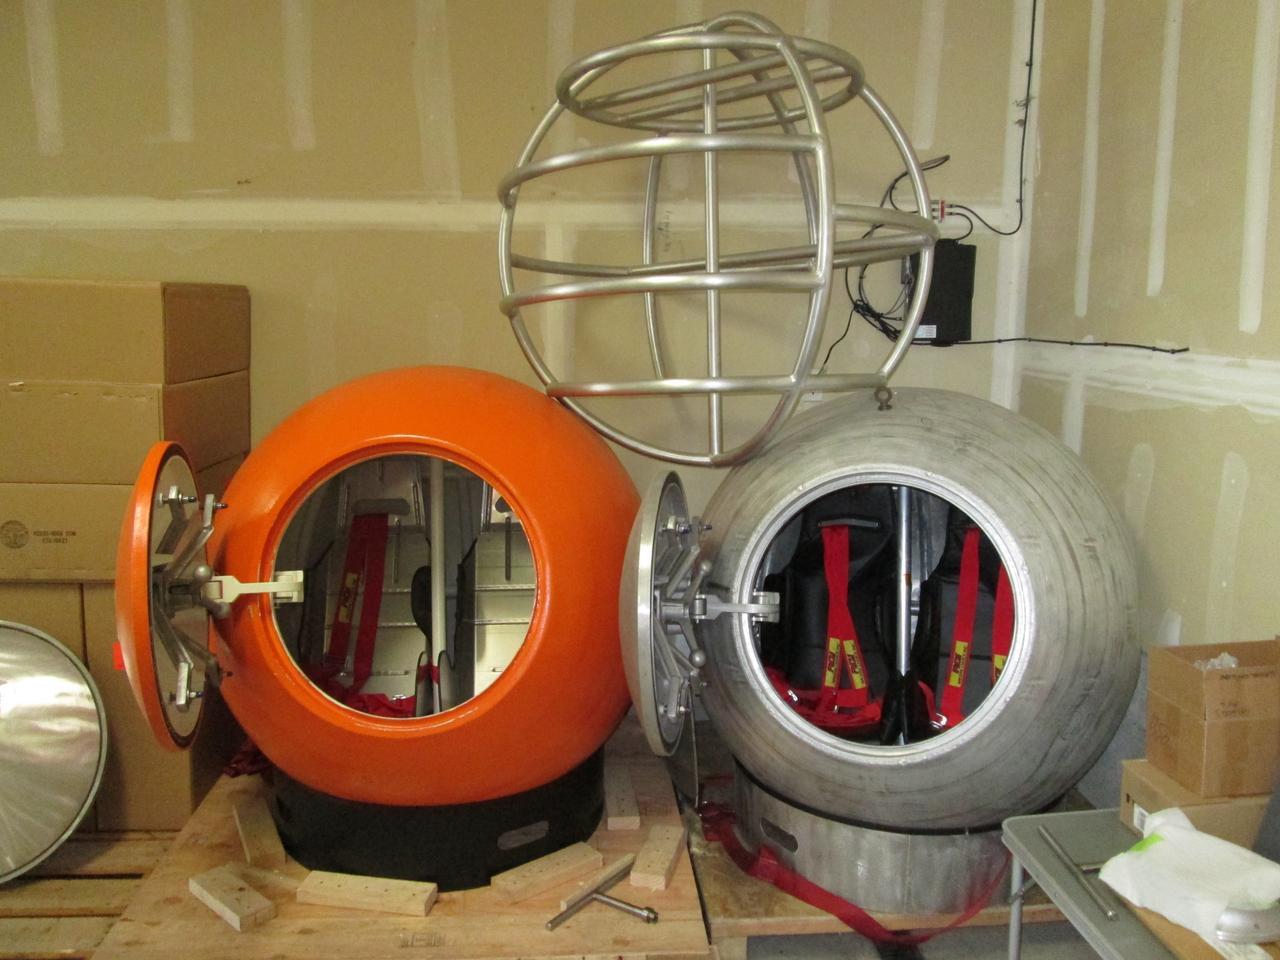 The Survival Capsule prototypes